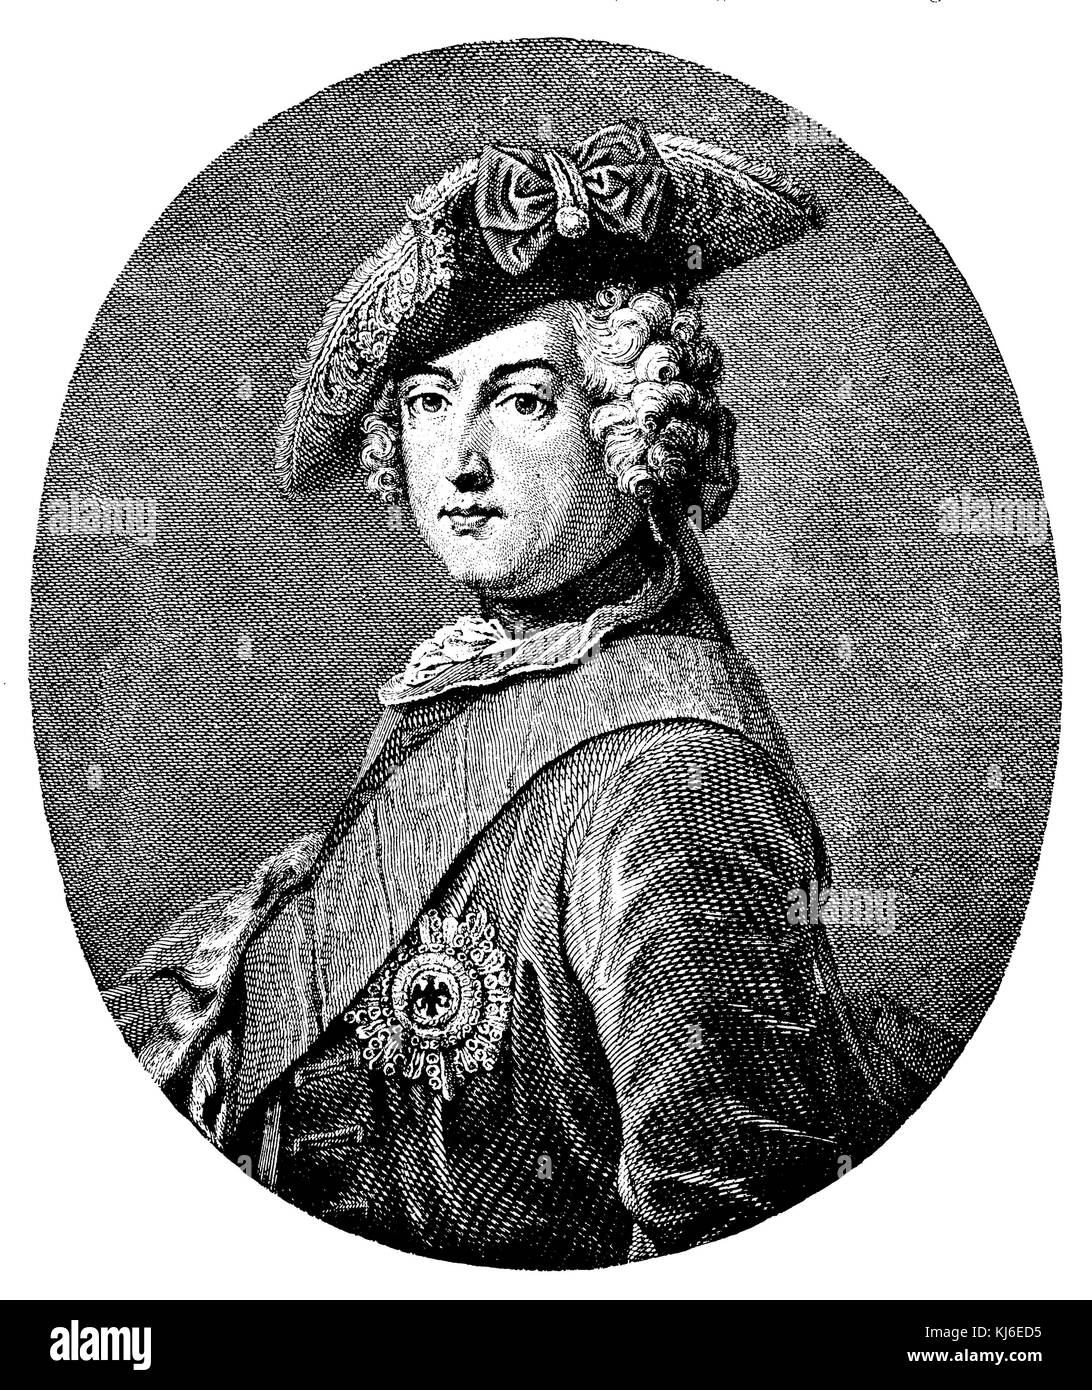 Frederick the Great (Friedrich der Große) - Stock Image